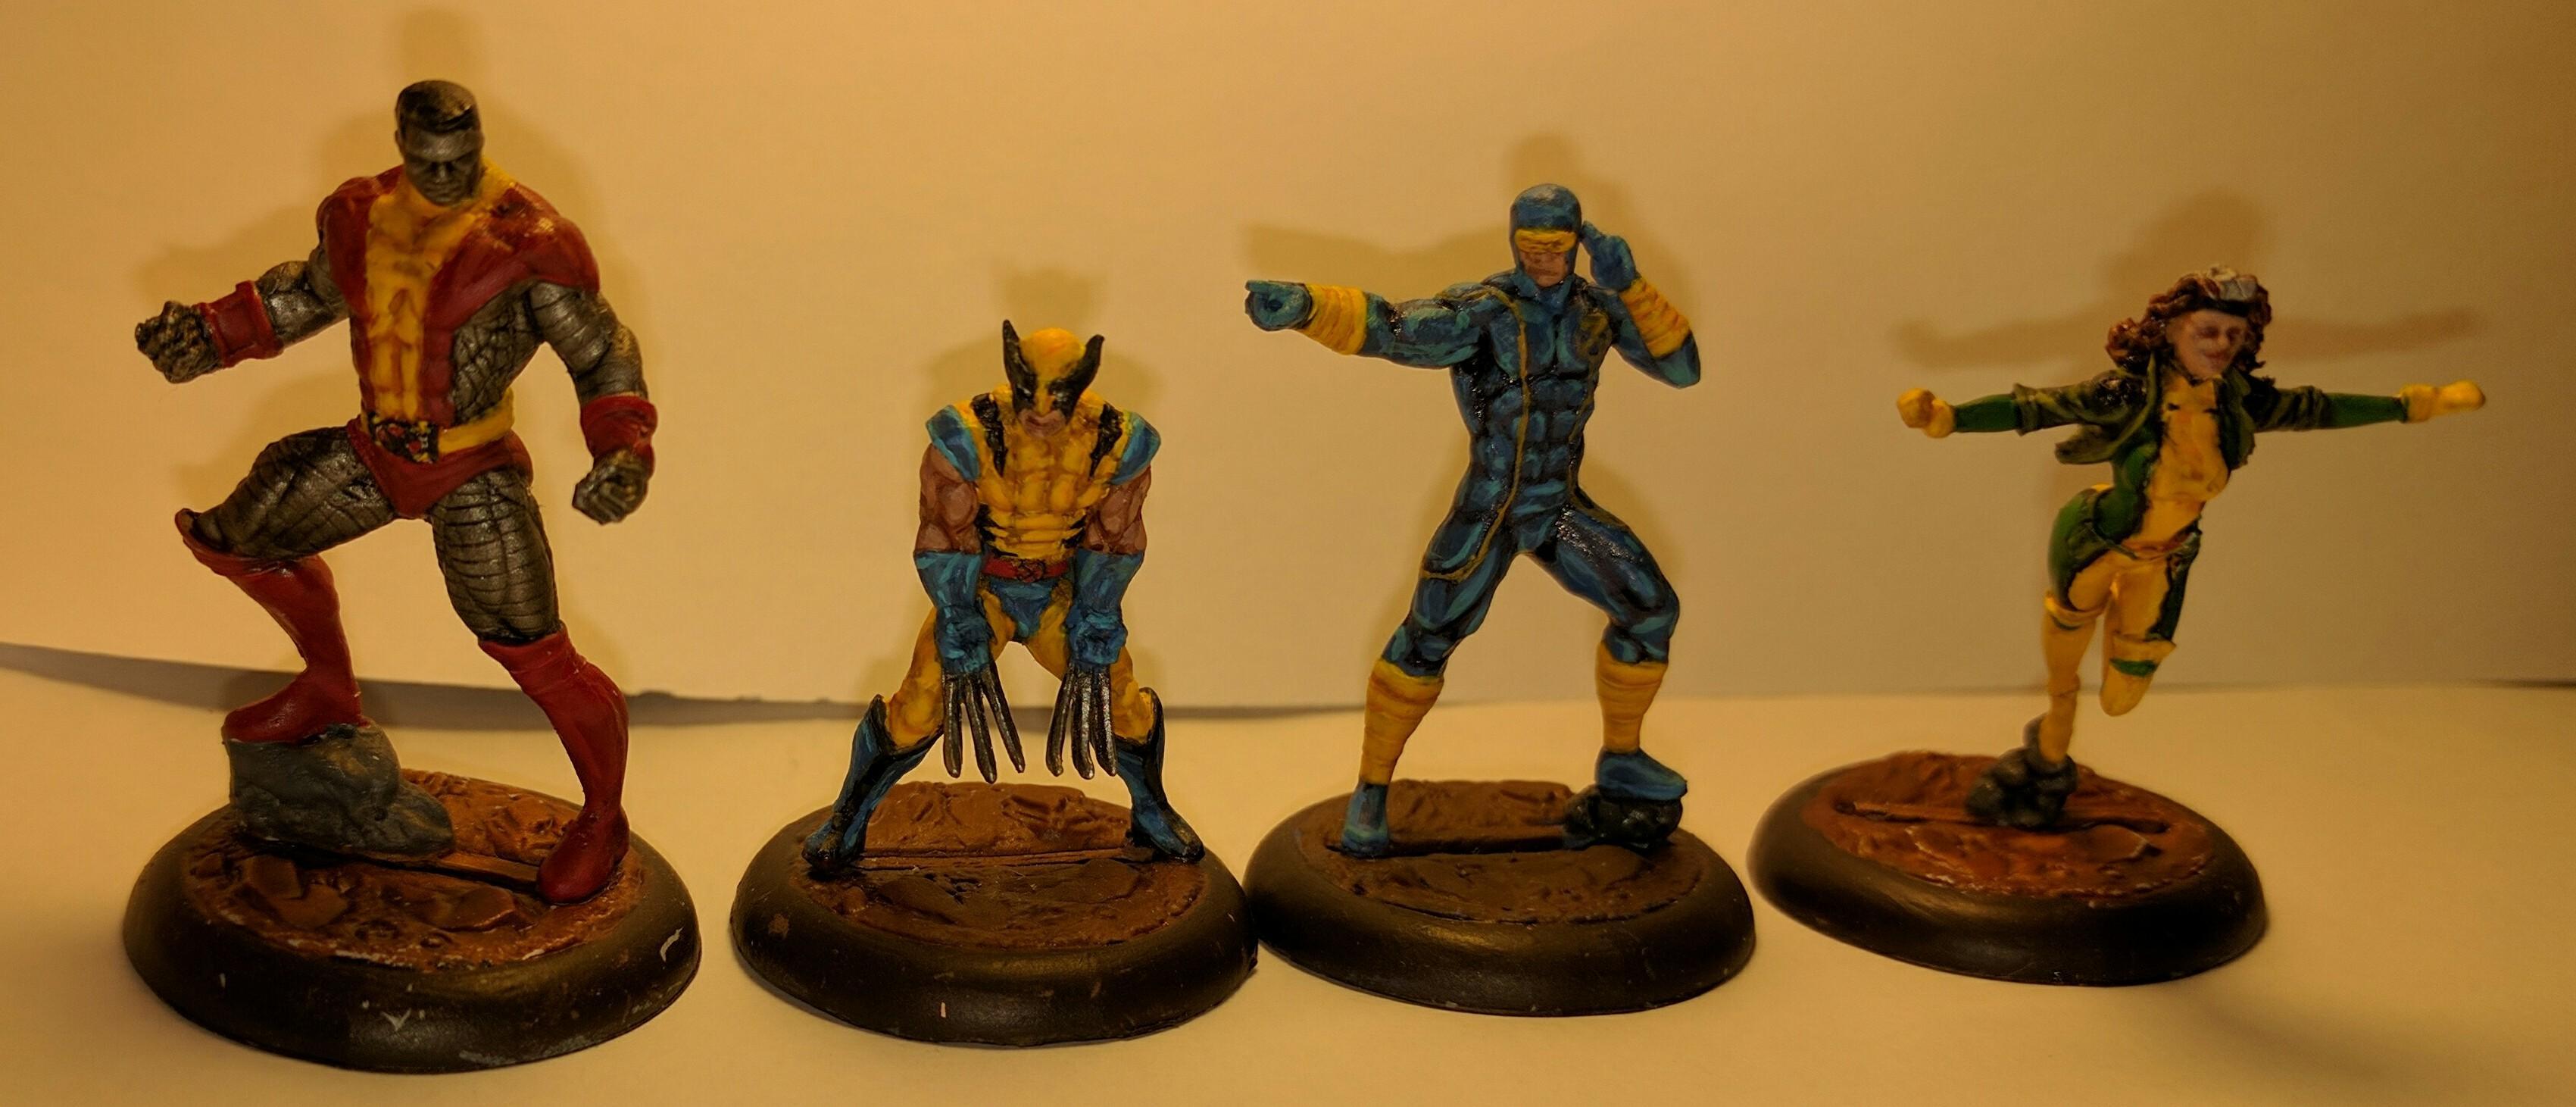 Arrow, Batman, Hulk, Iron Man, Justice League, Magneto, Marvel, X-men